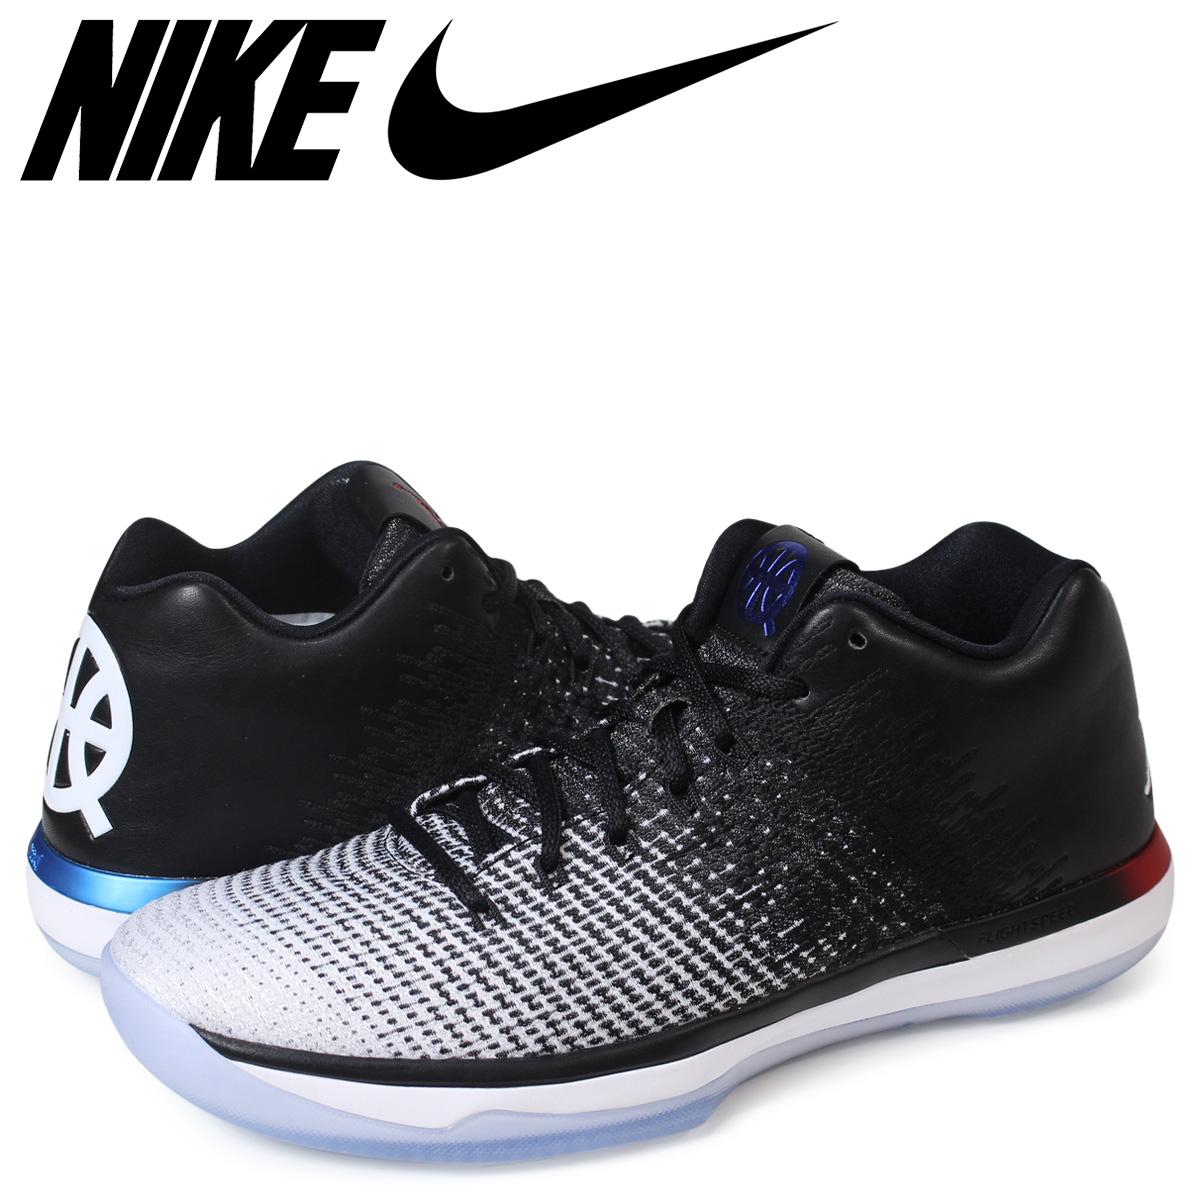 8a626da856a NIKE Nike Air Jordan 31 nostalgic sneakers AIR JORDAN 31 XXX1 LOW QUAI 54  921